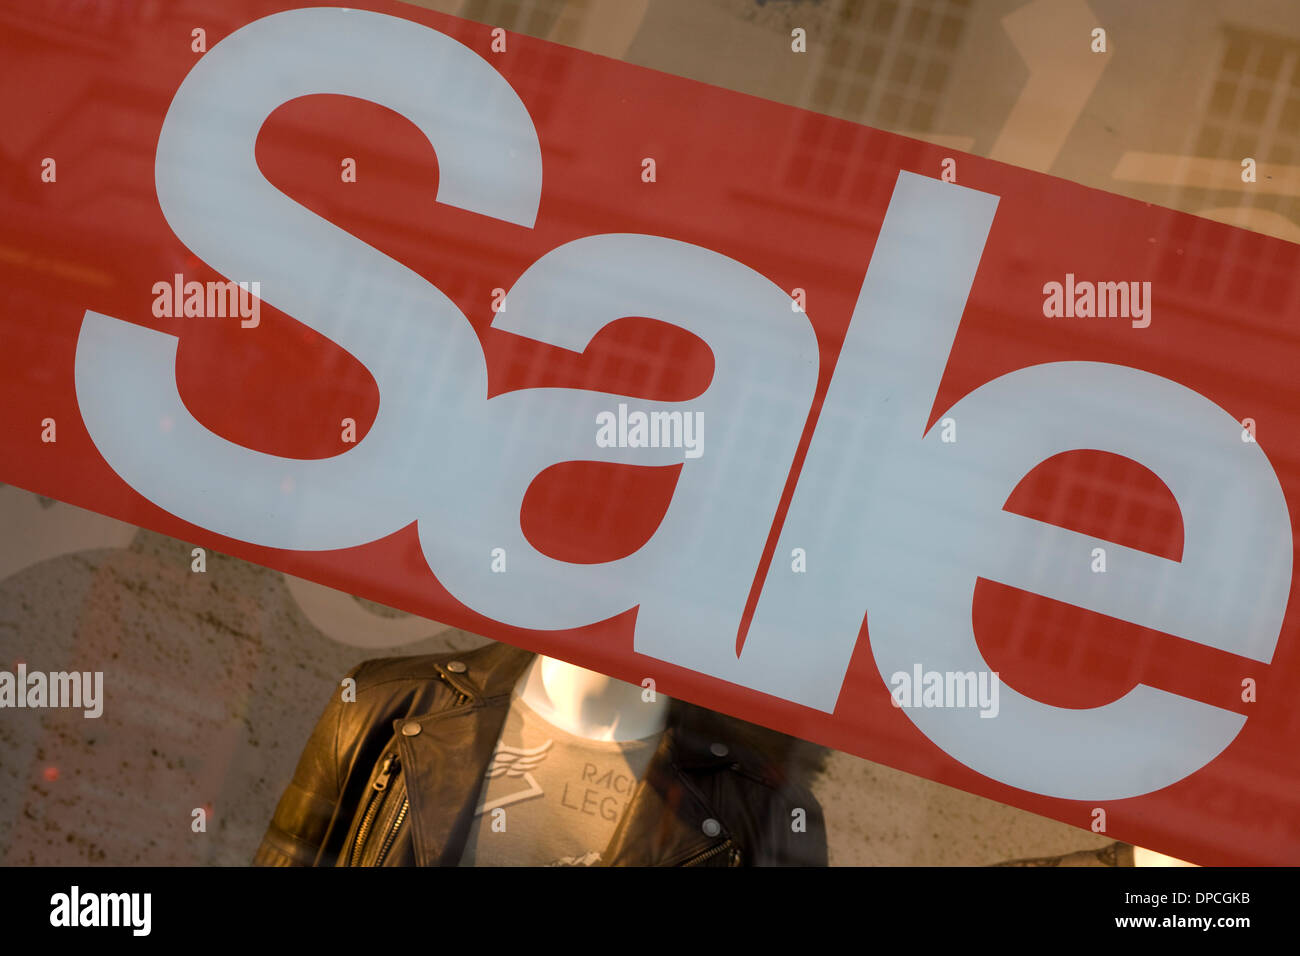 Vente Sign in high street shop windows Banque D'Images